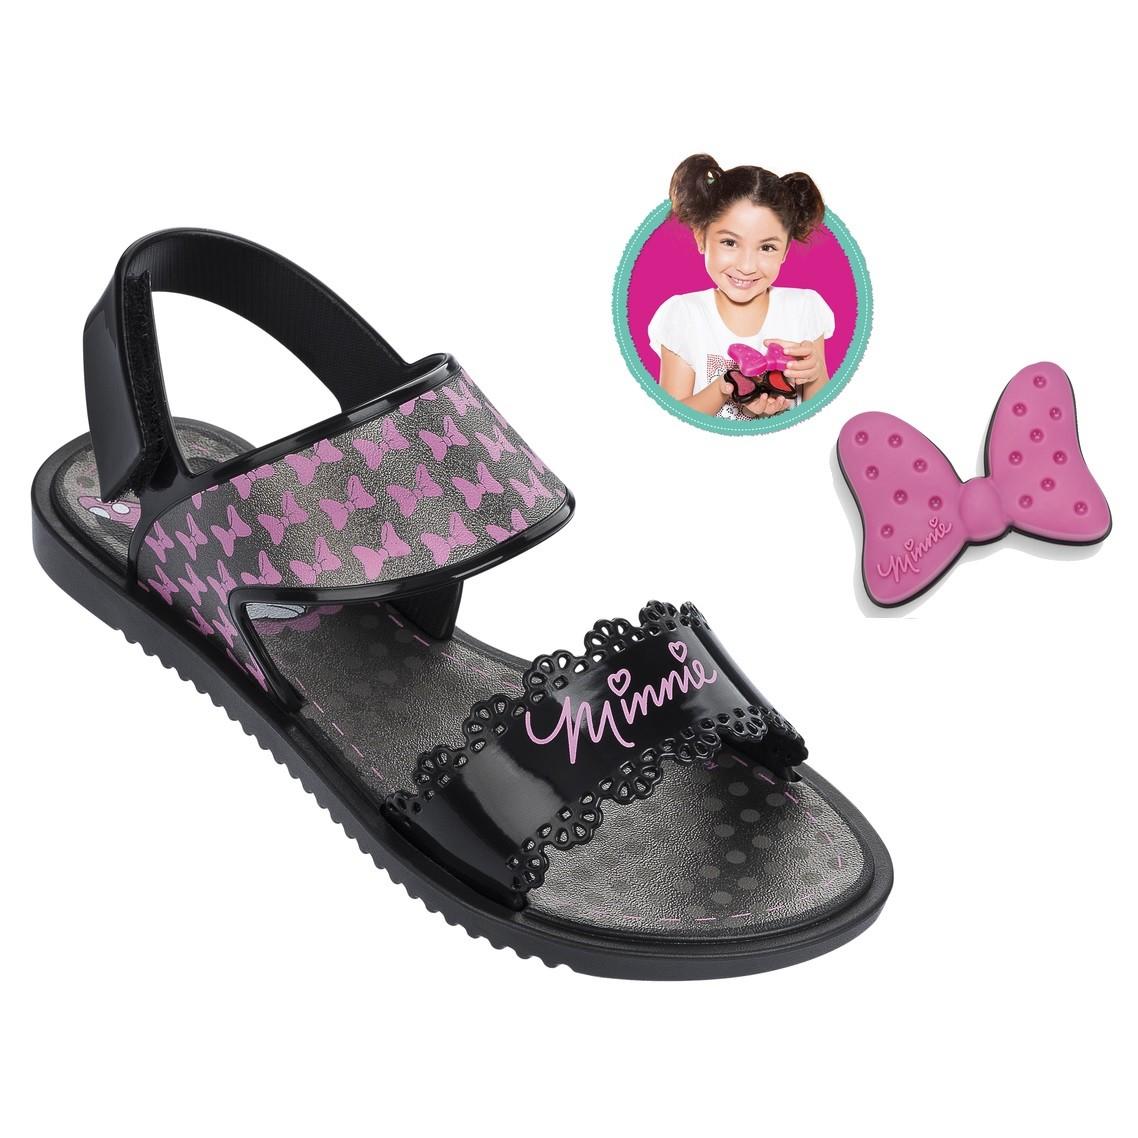 5b422355f5d79 Sandália Grendene Infantil Disney Minnie Fashion (Com Brinde) 21366-22775  Preto Prata